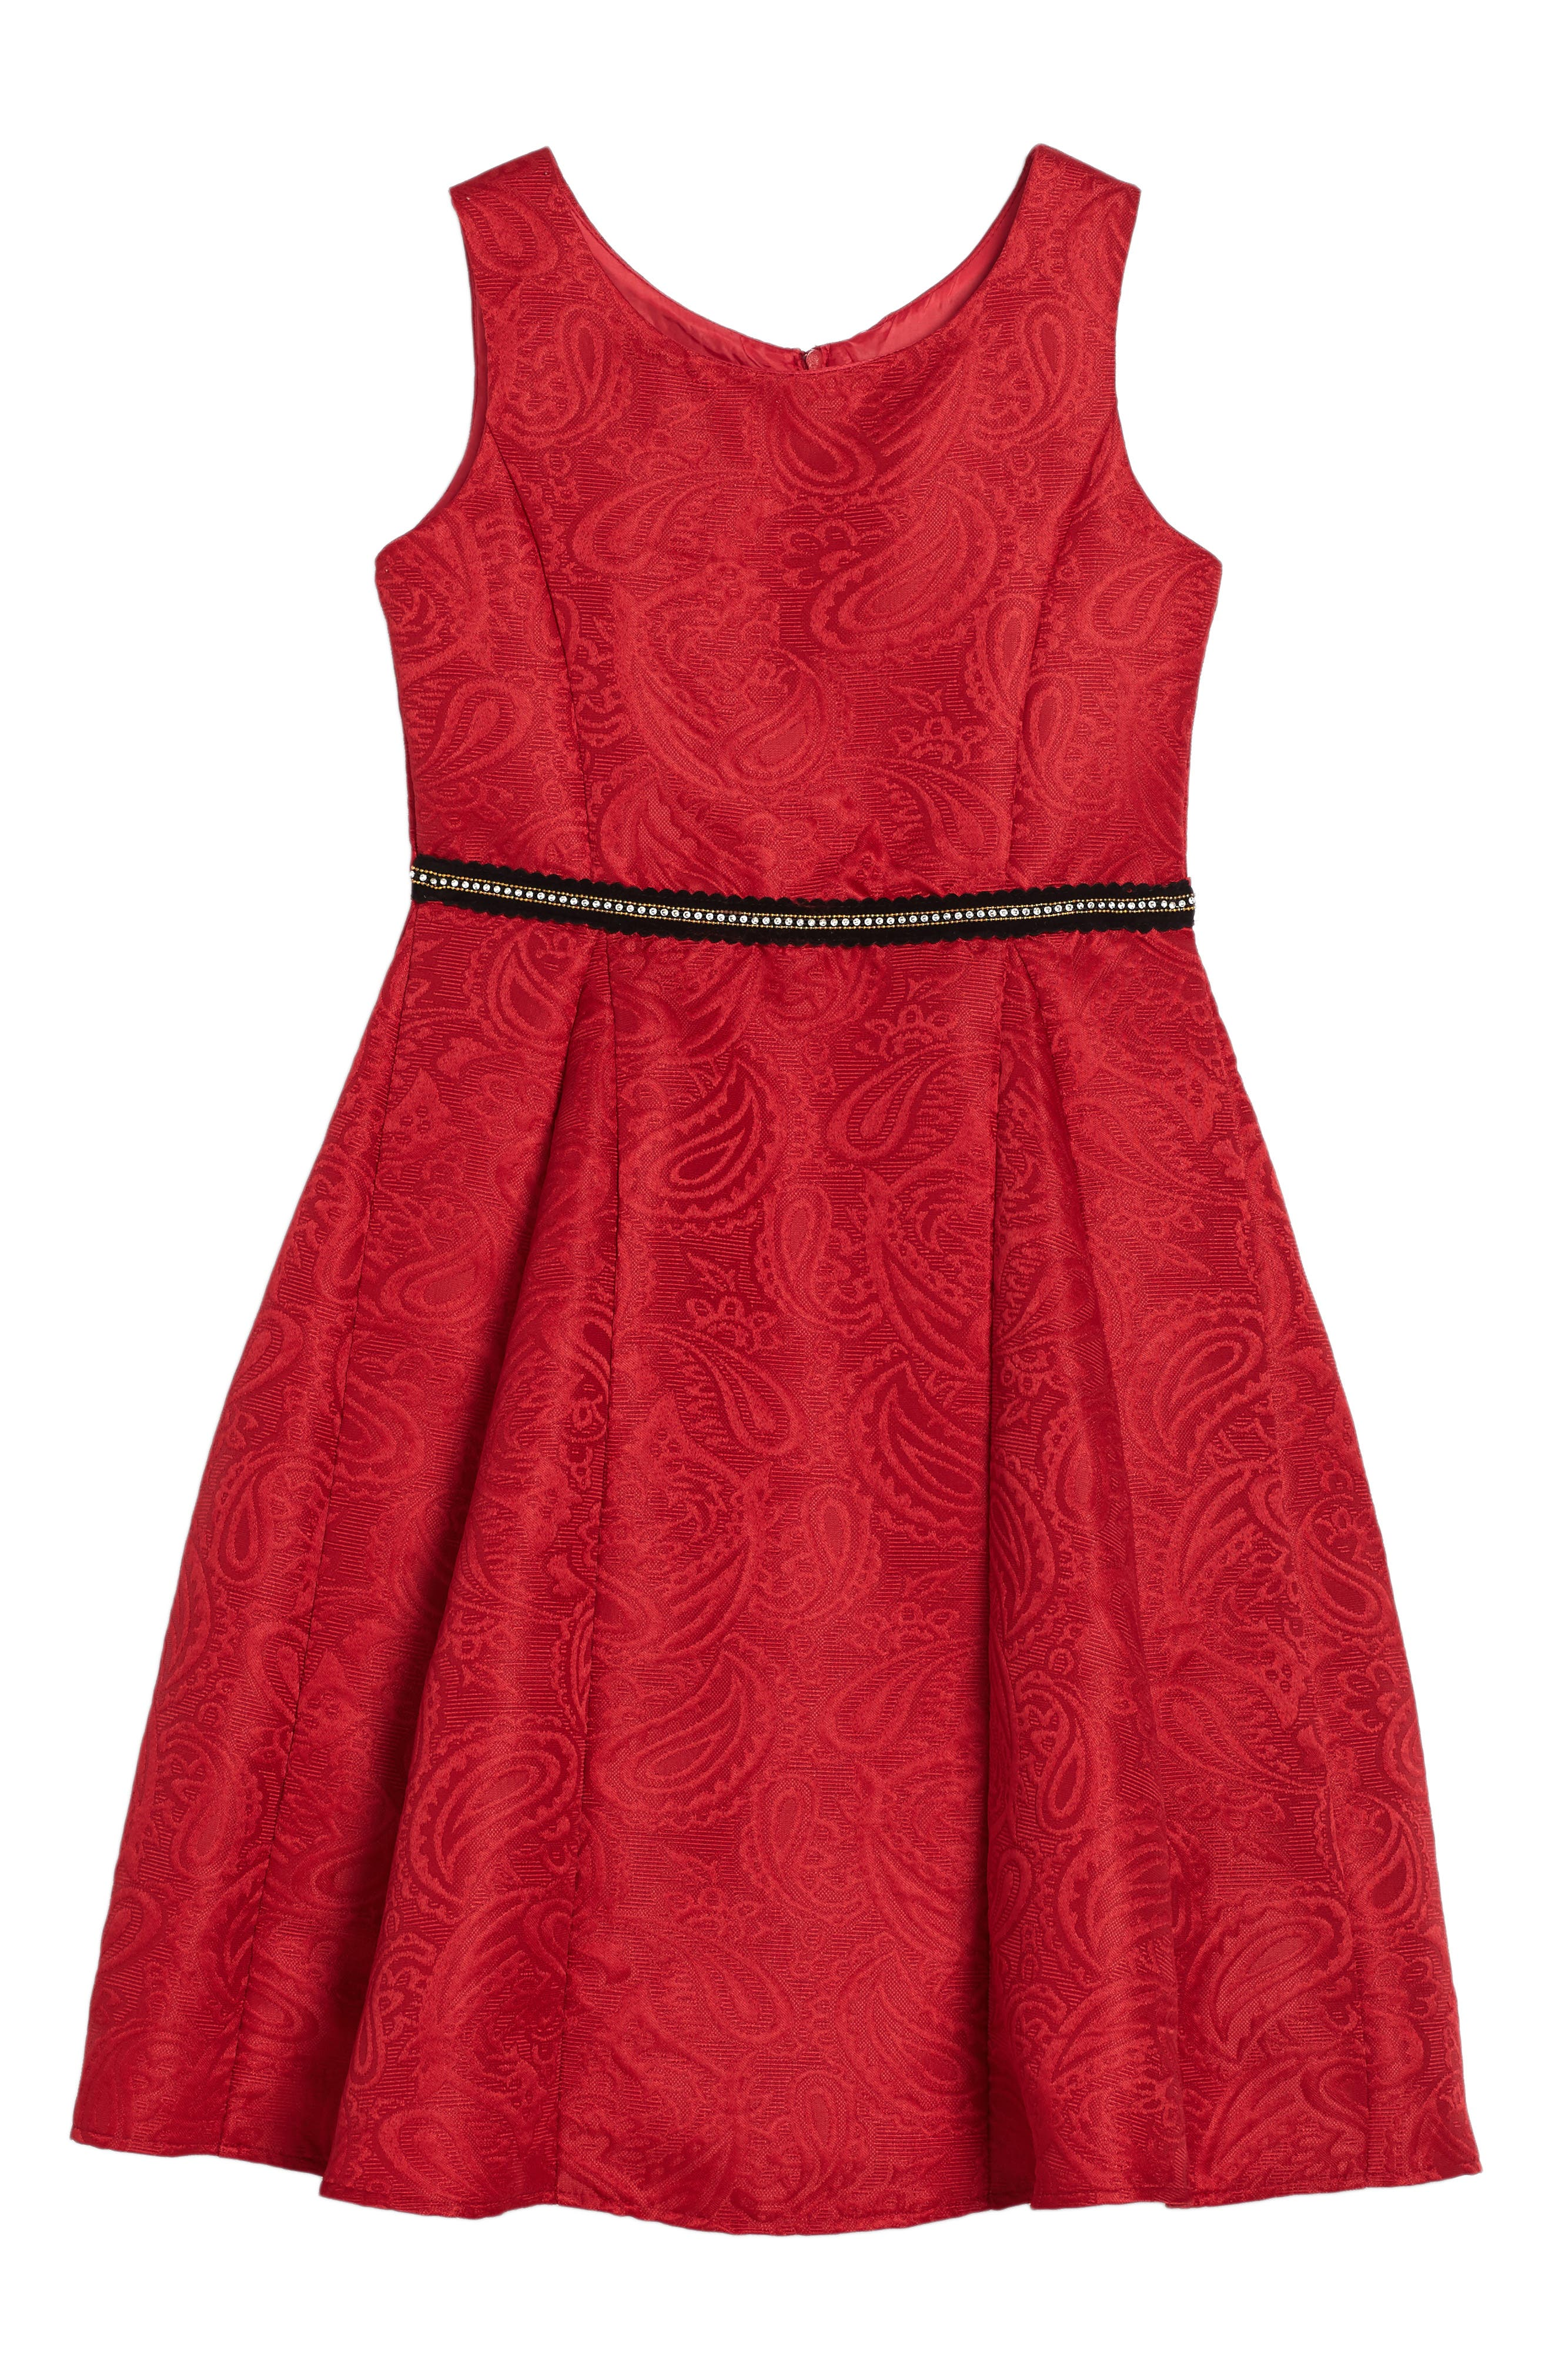 Hannah Jacquard Dress,                         Main,                         color, Red